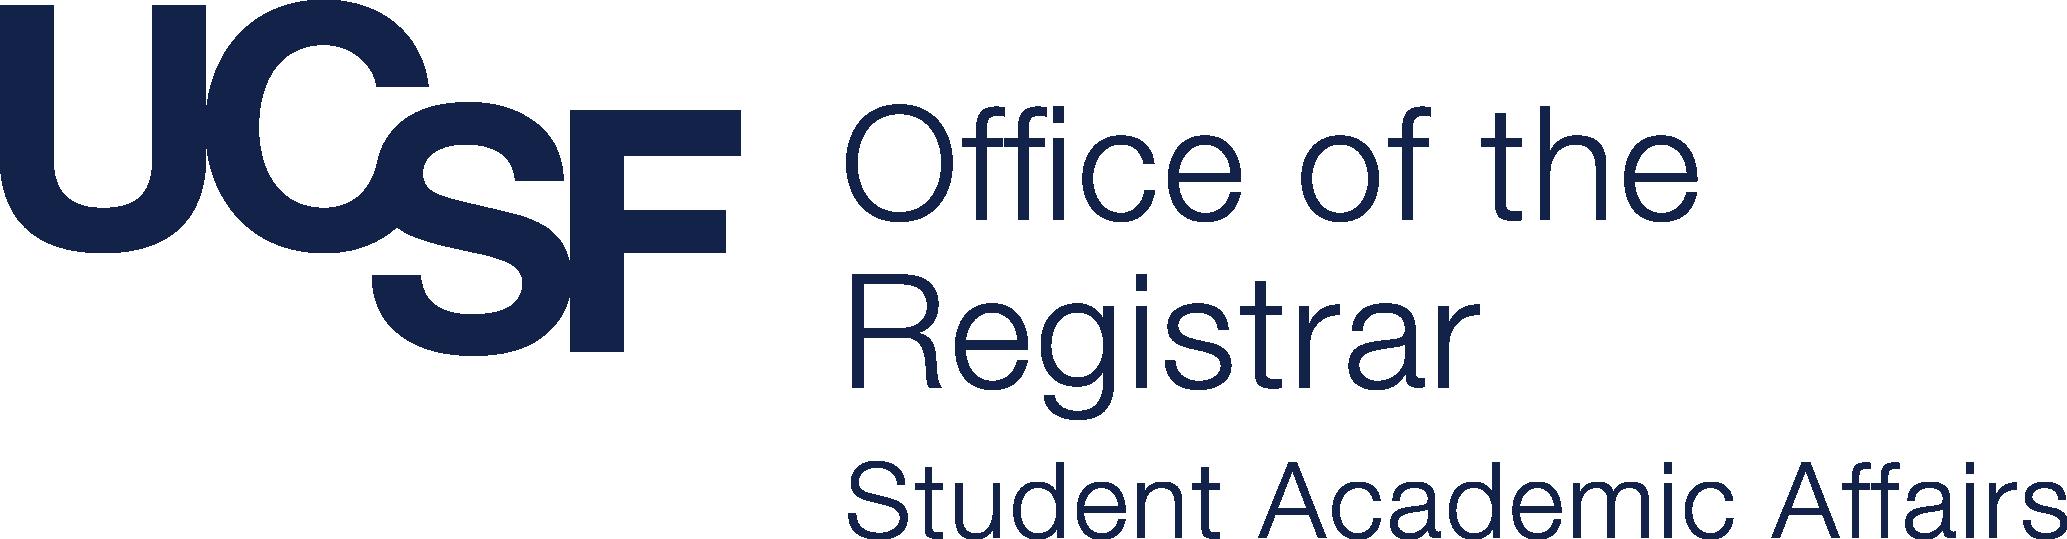 Ccsf Academic Calendar 2022.Academic Calendar Ucsf Office Of The Registrar